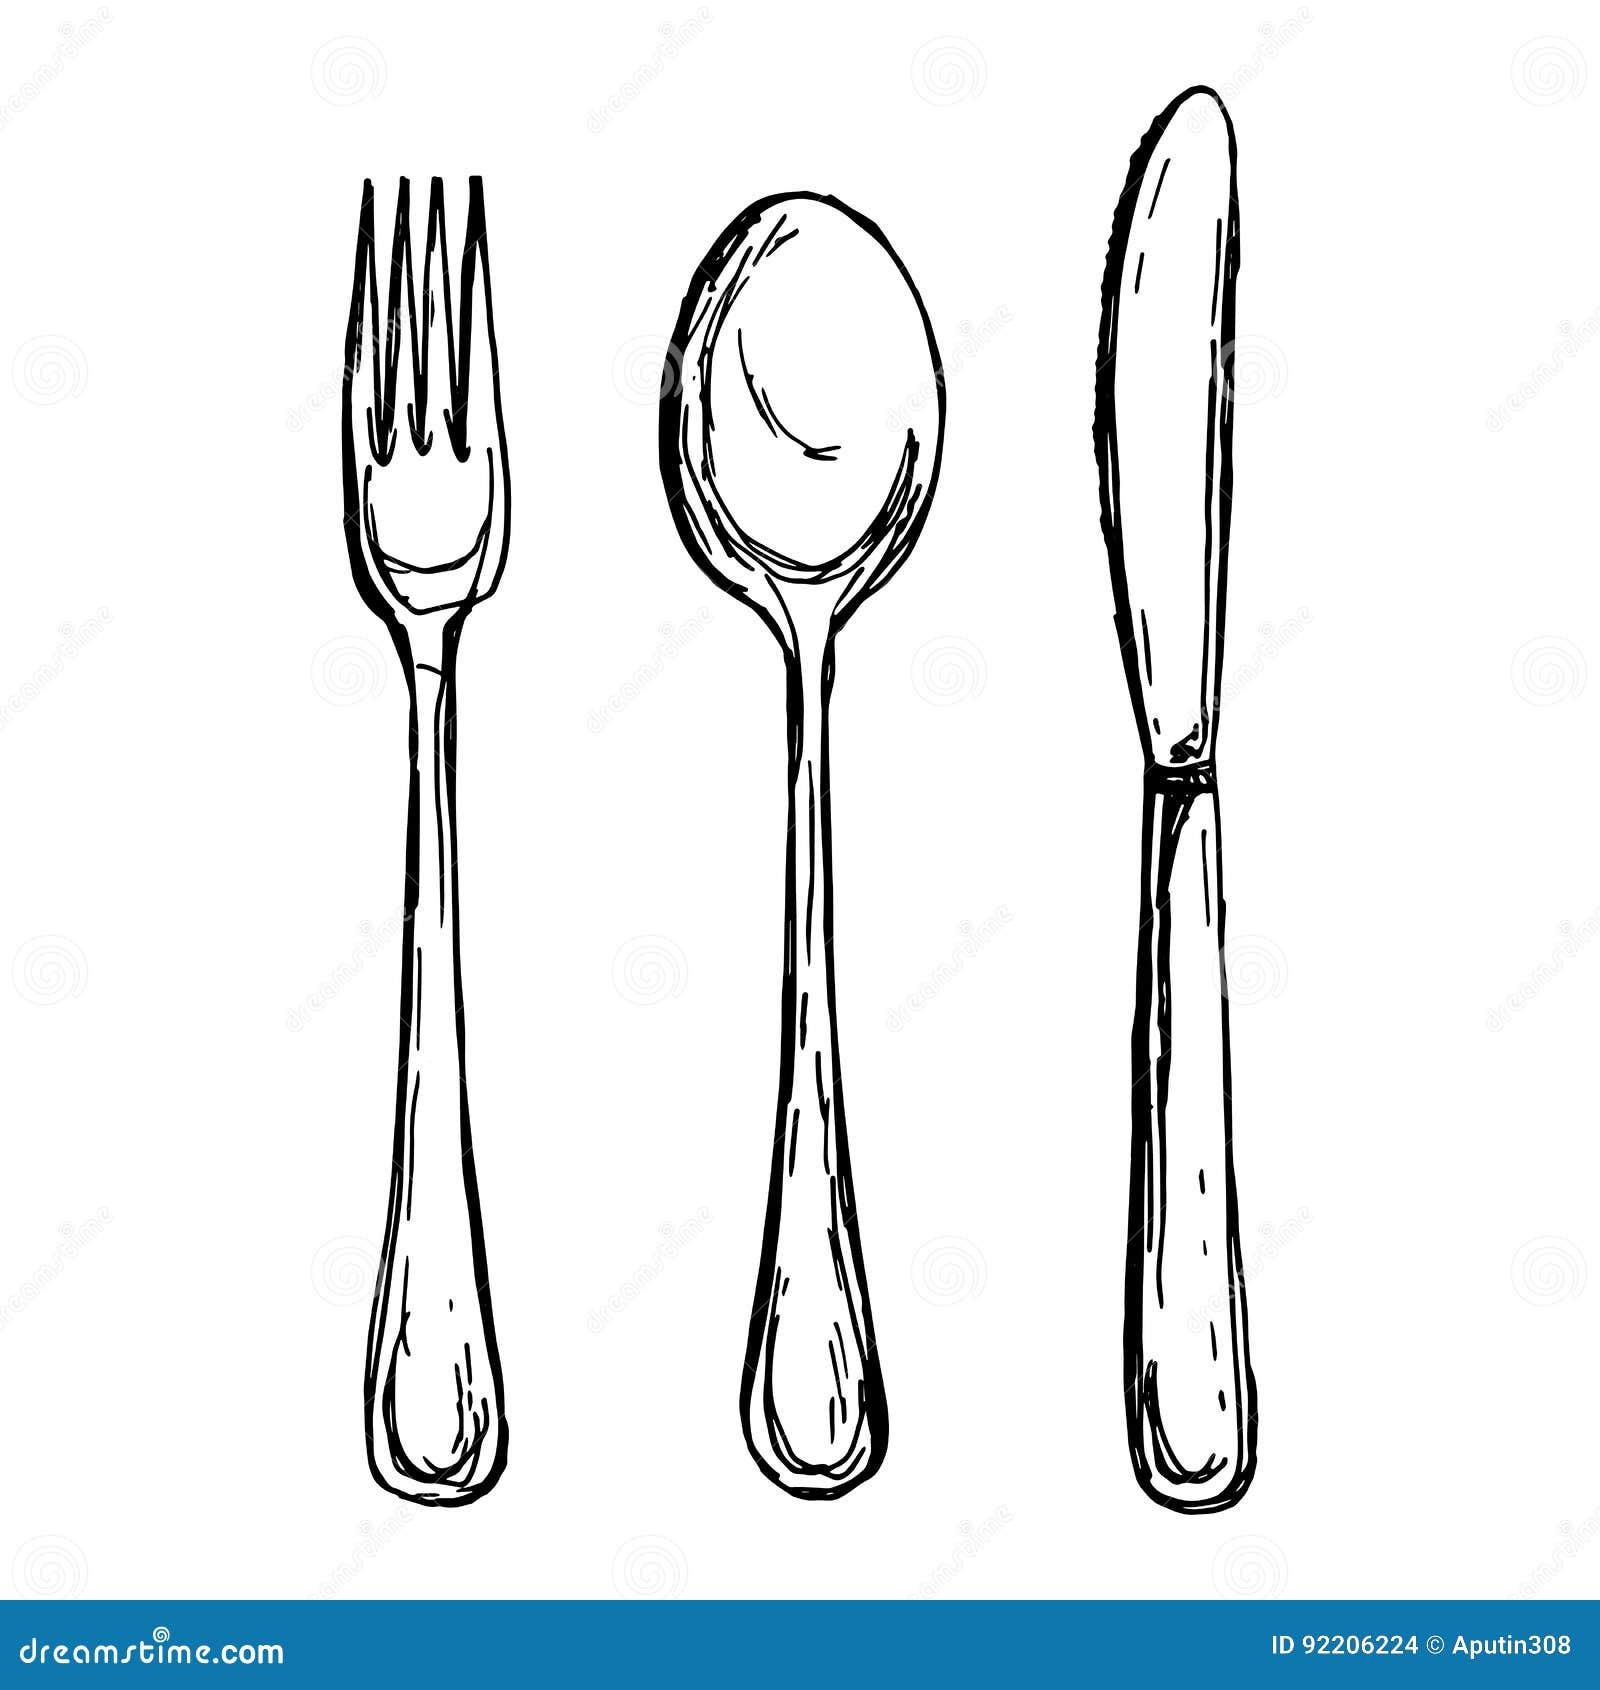 Vector Illustration Of Vintage Spoon Fork And Knife